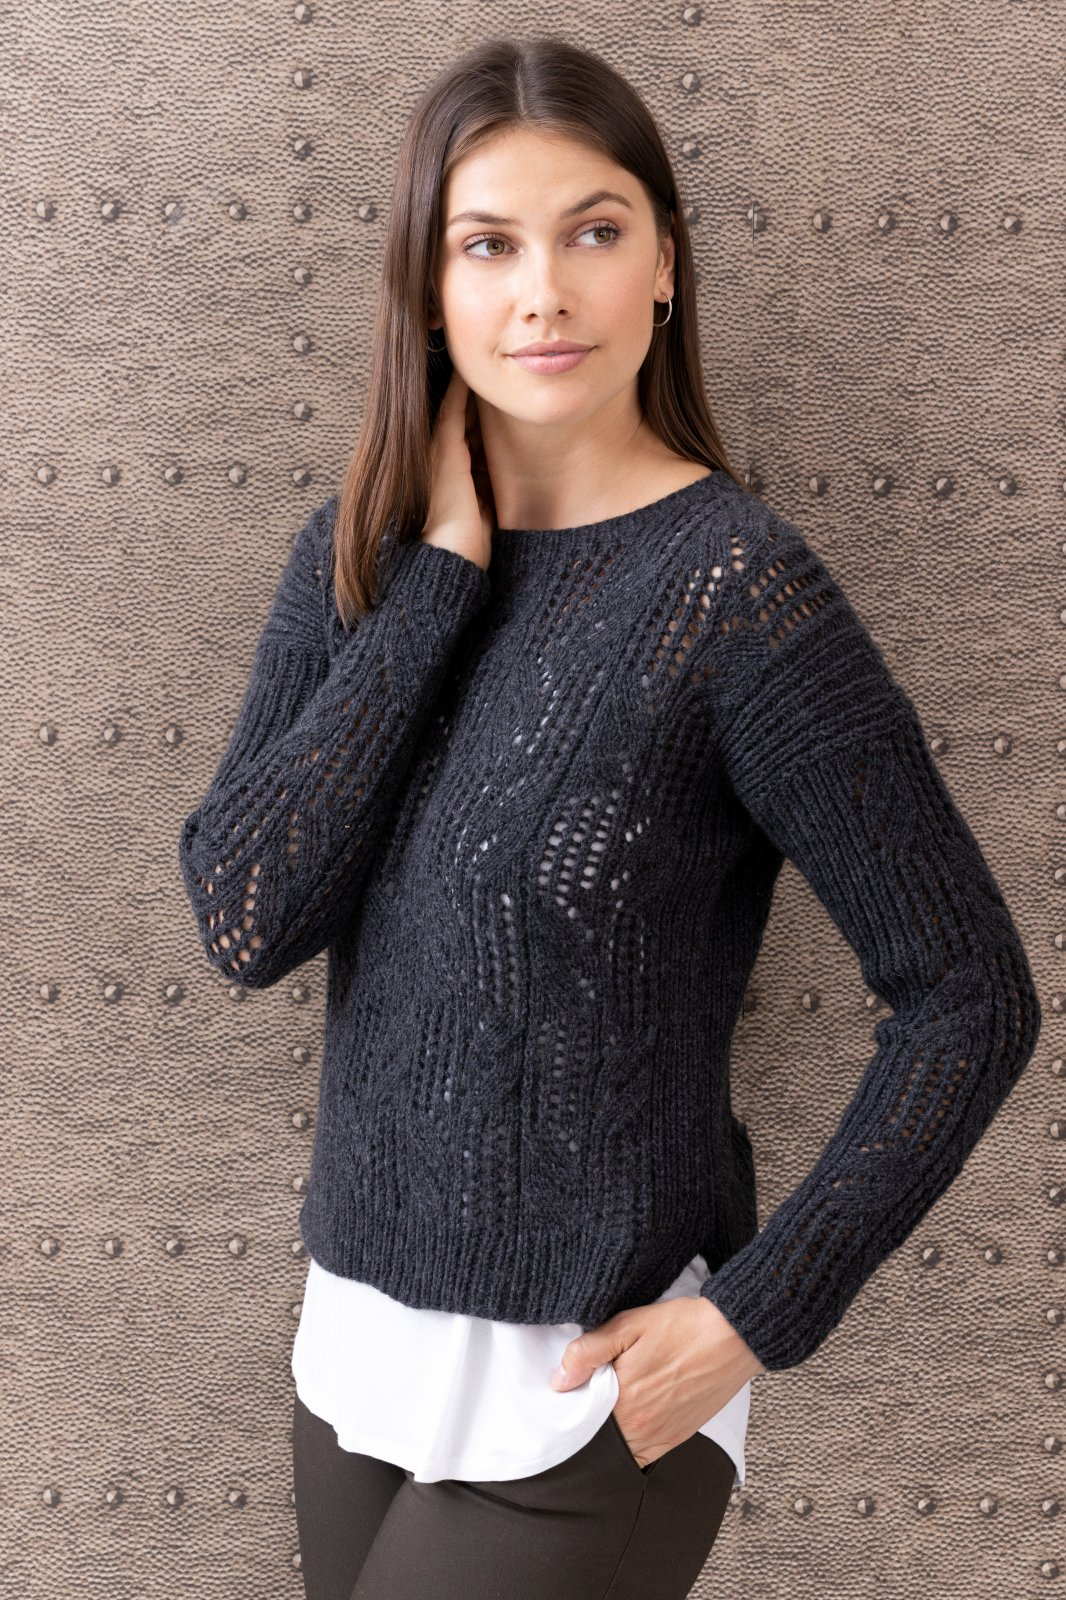 Carolina Lace Pullover Kit (String)